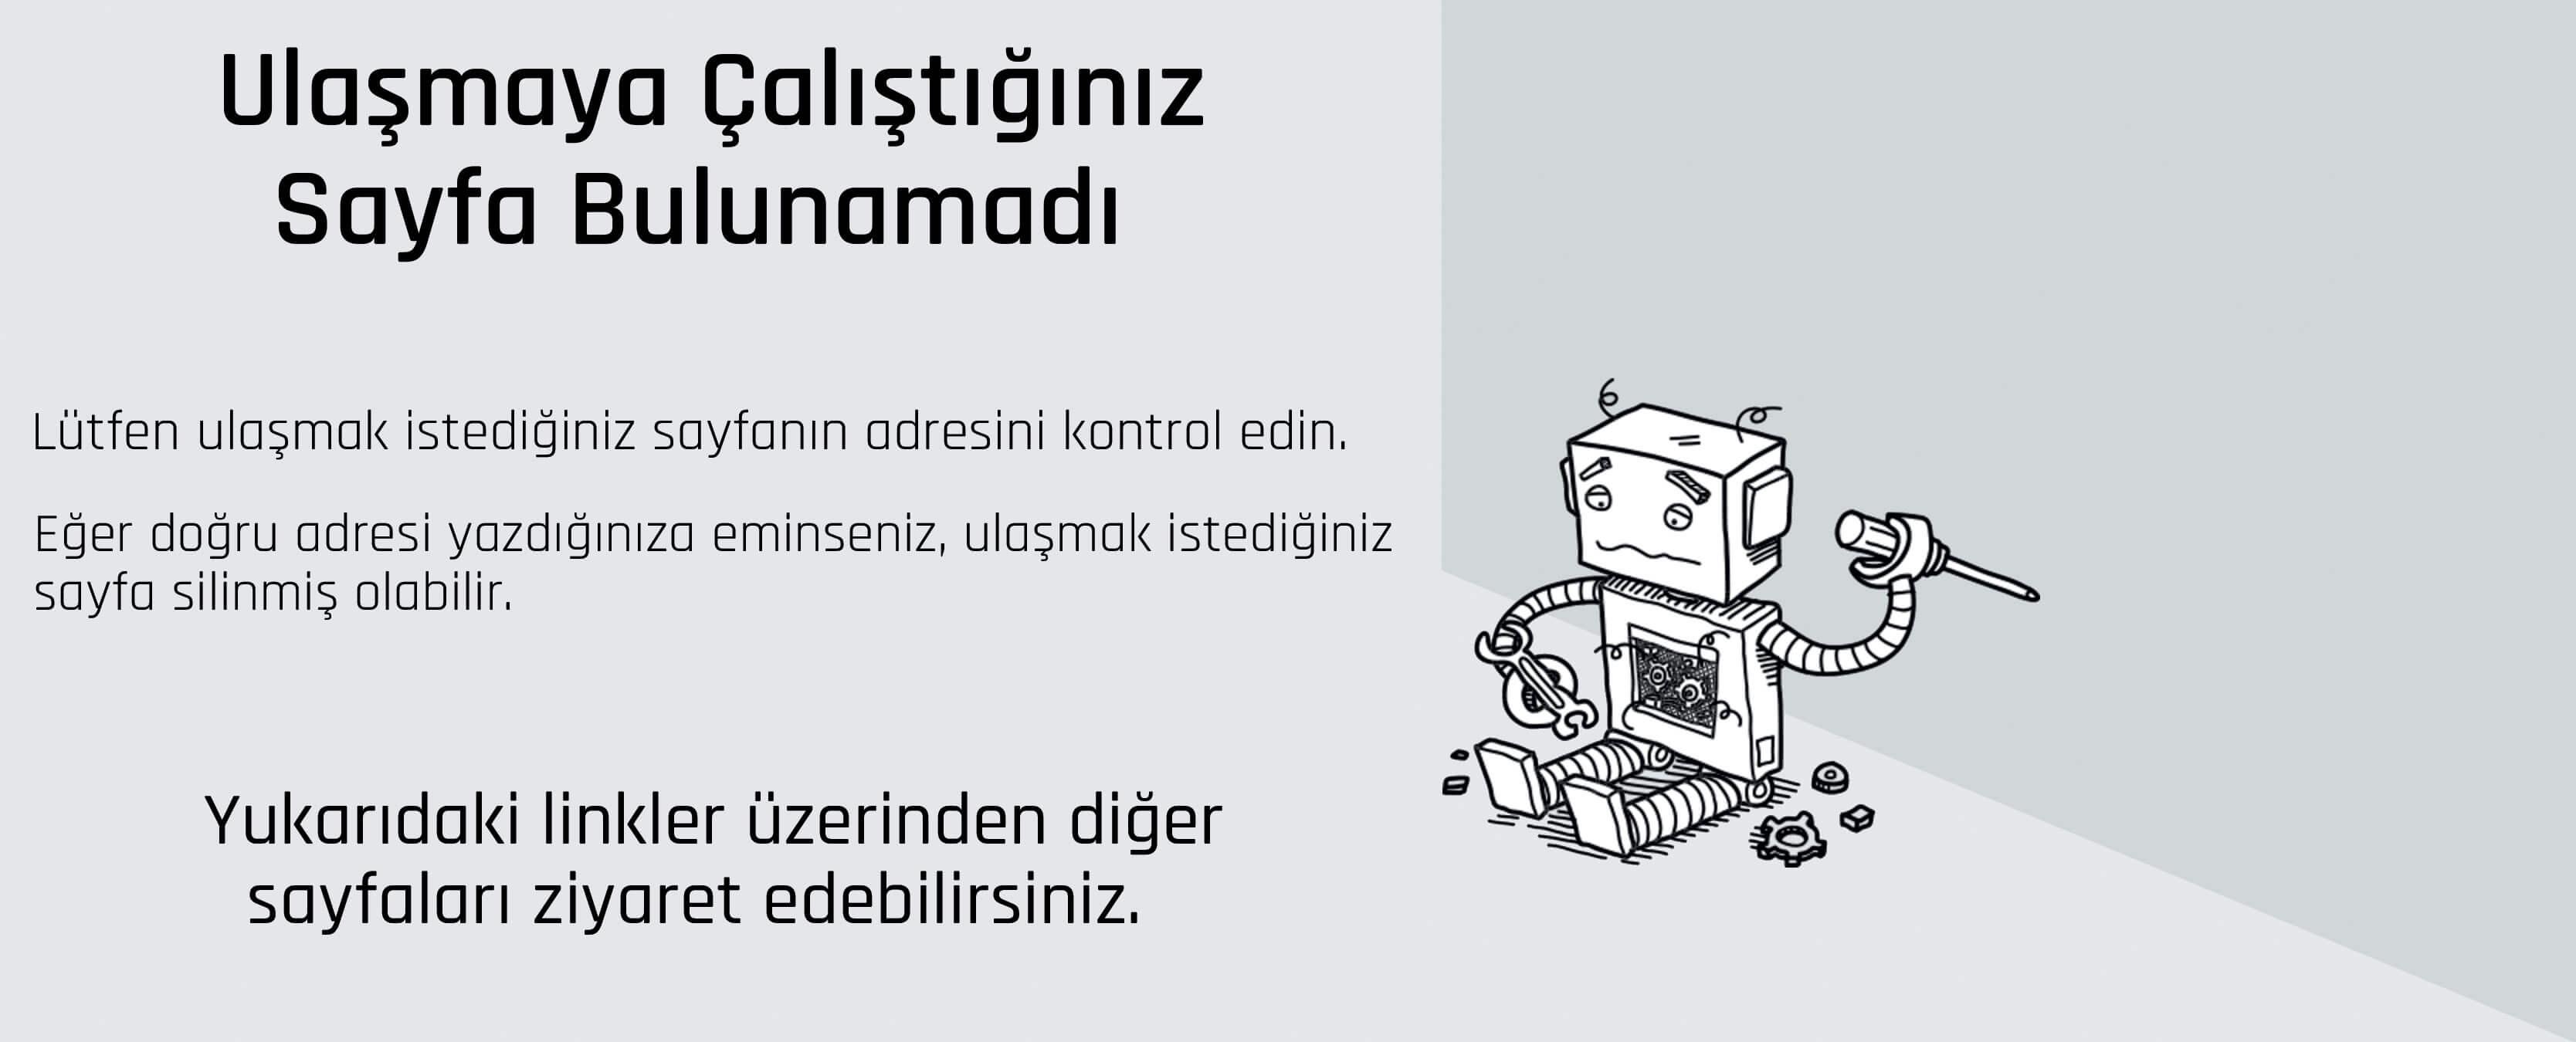 https://www.hrbilisim.com/